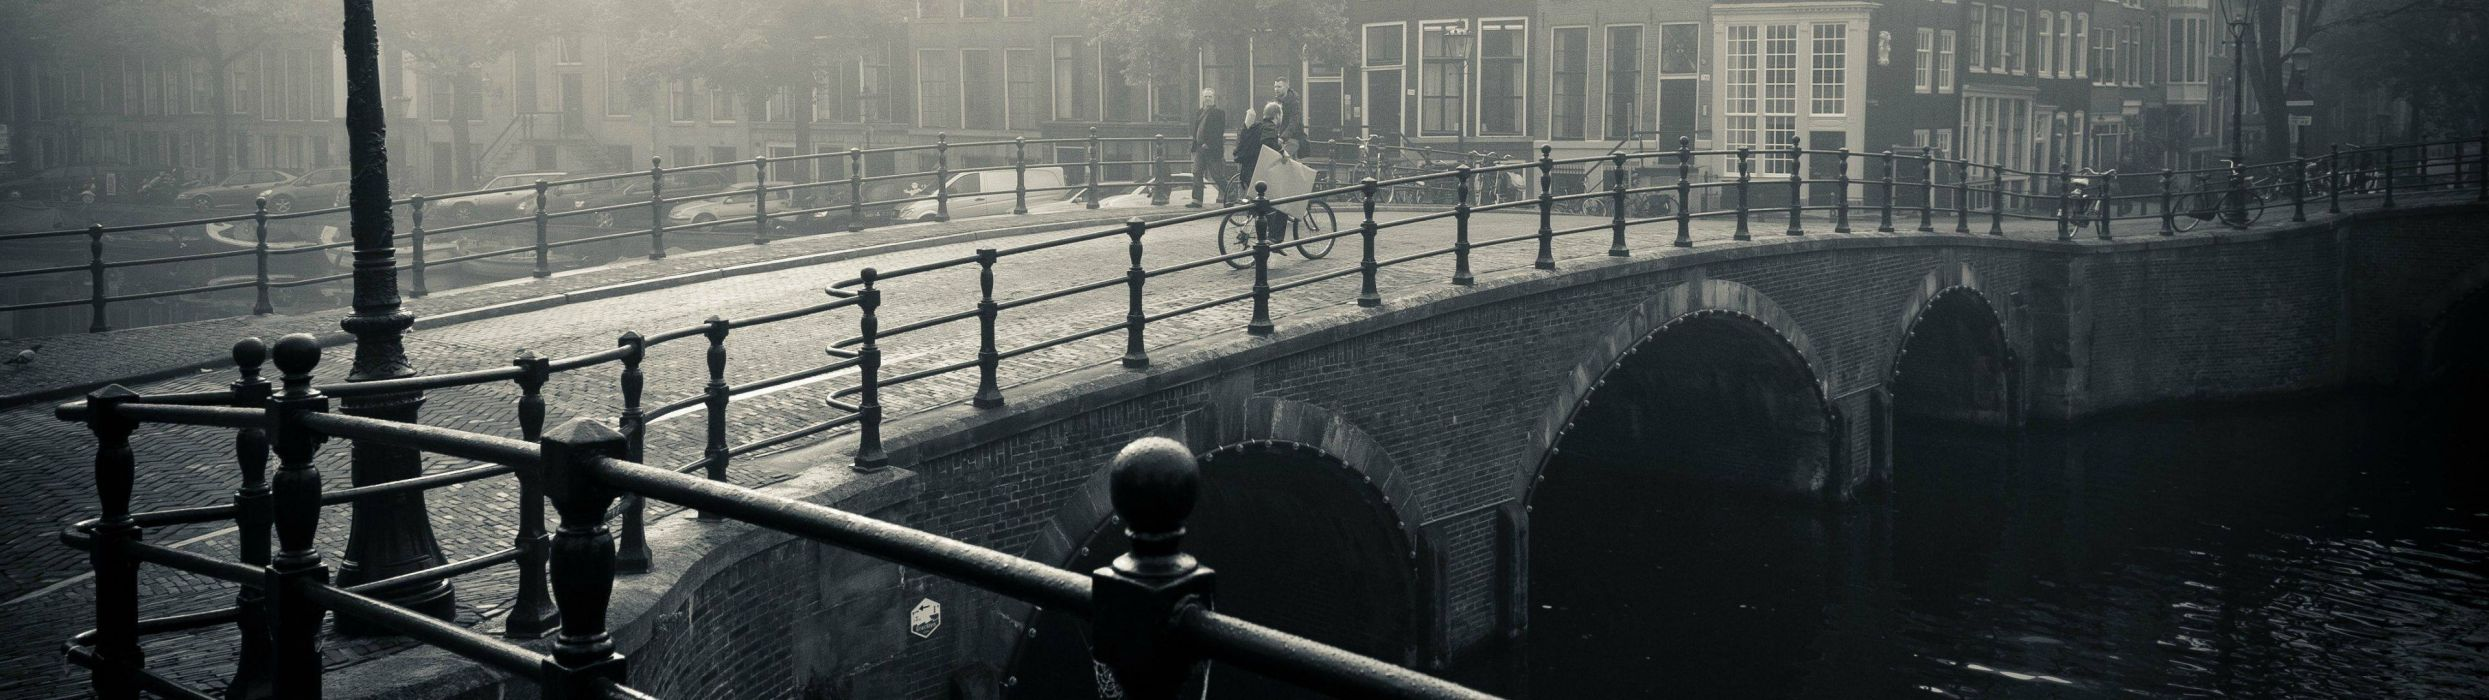 city river bridge cyclist walking downtown black and white people situation bike man mood wallpaper